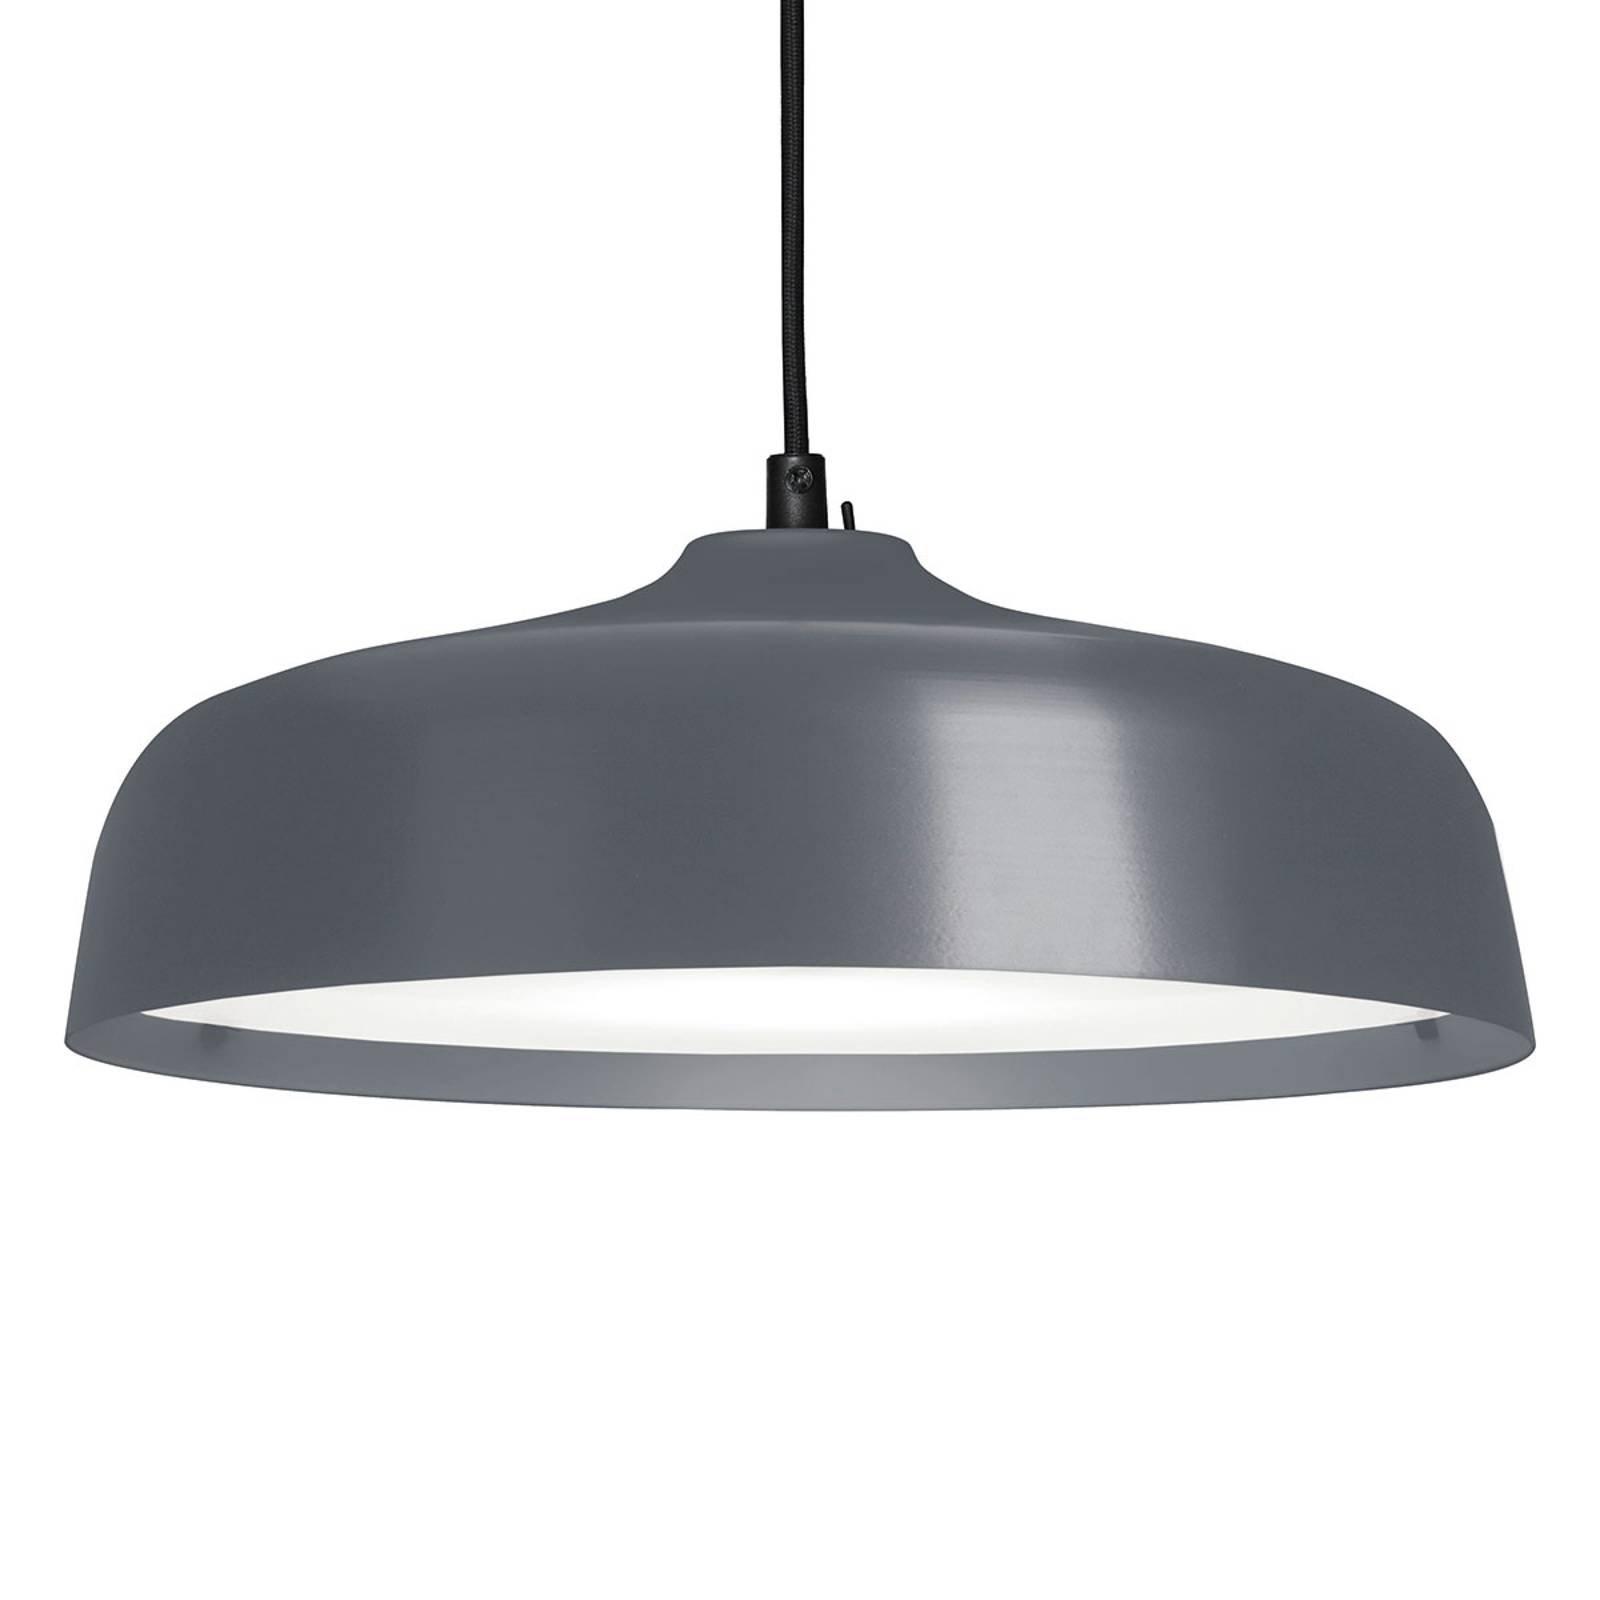 Innolux Candeo Air LED-hengelampe, grafitt